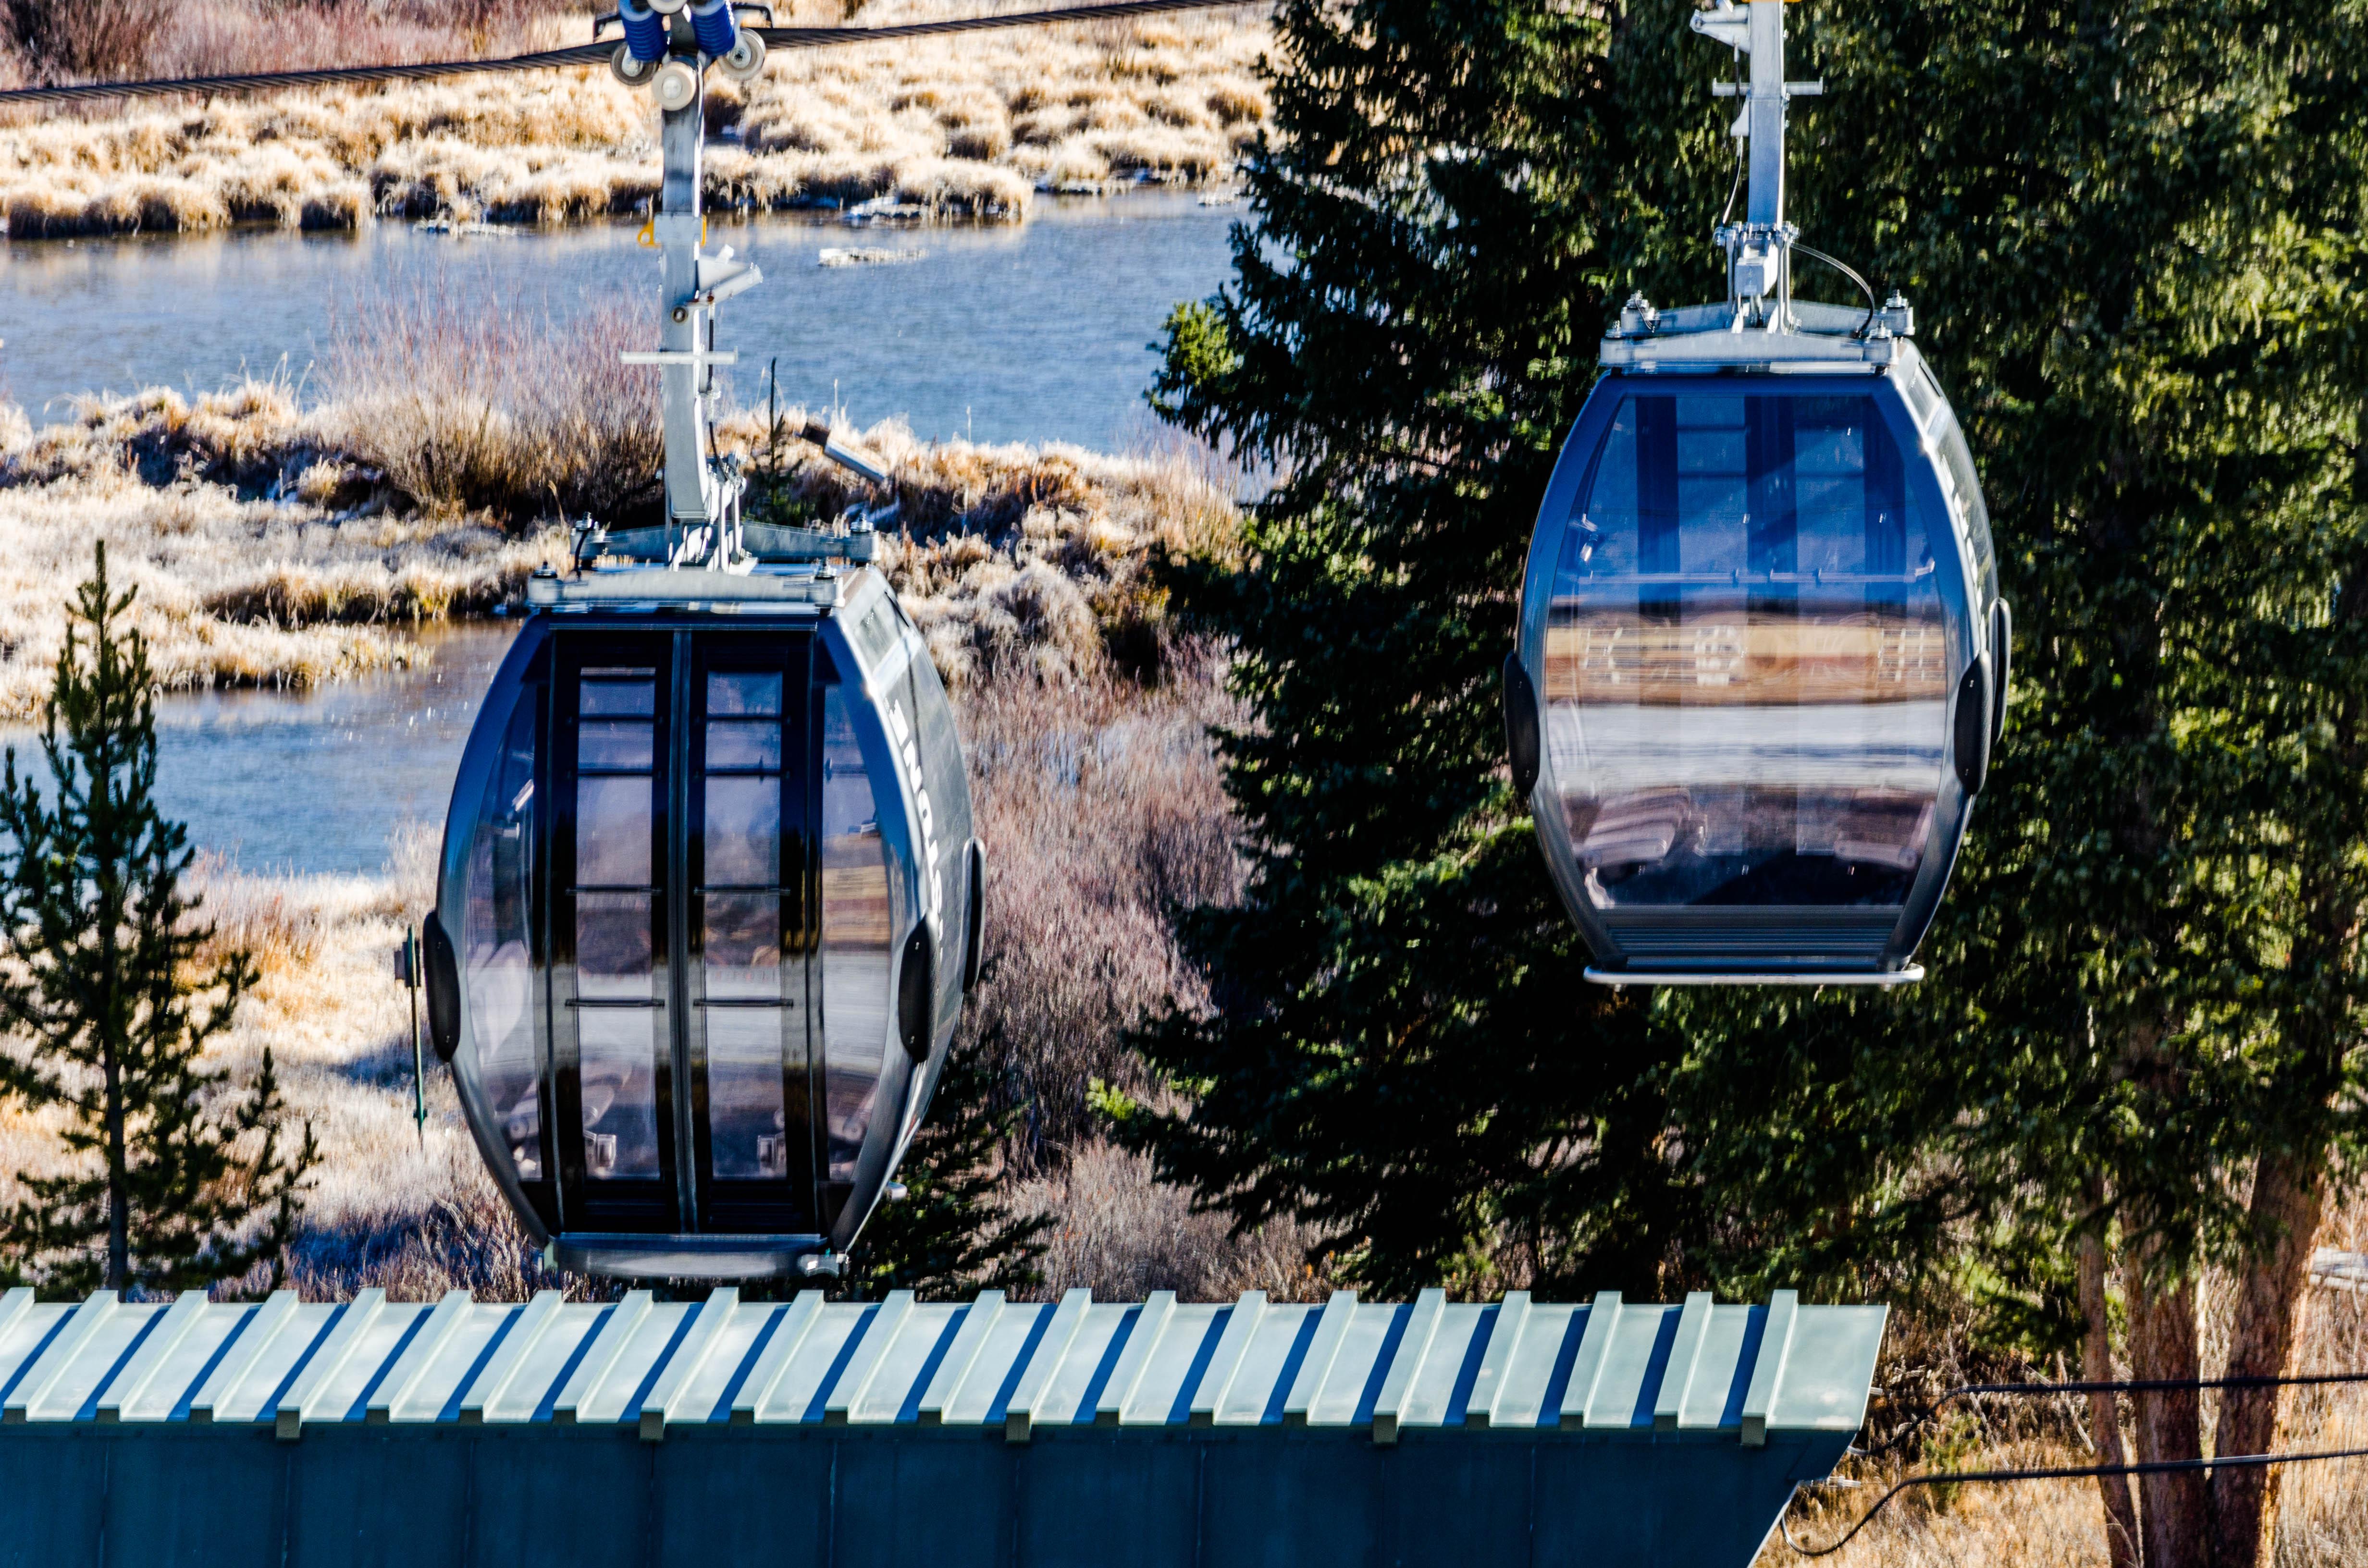 M. Scenic Gondola Ride